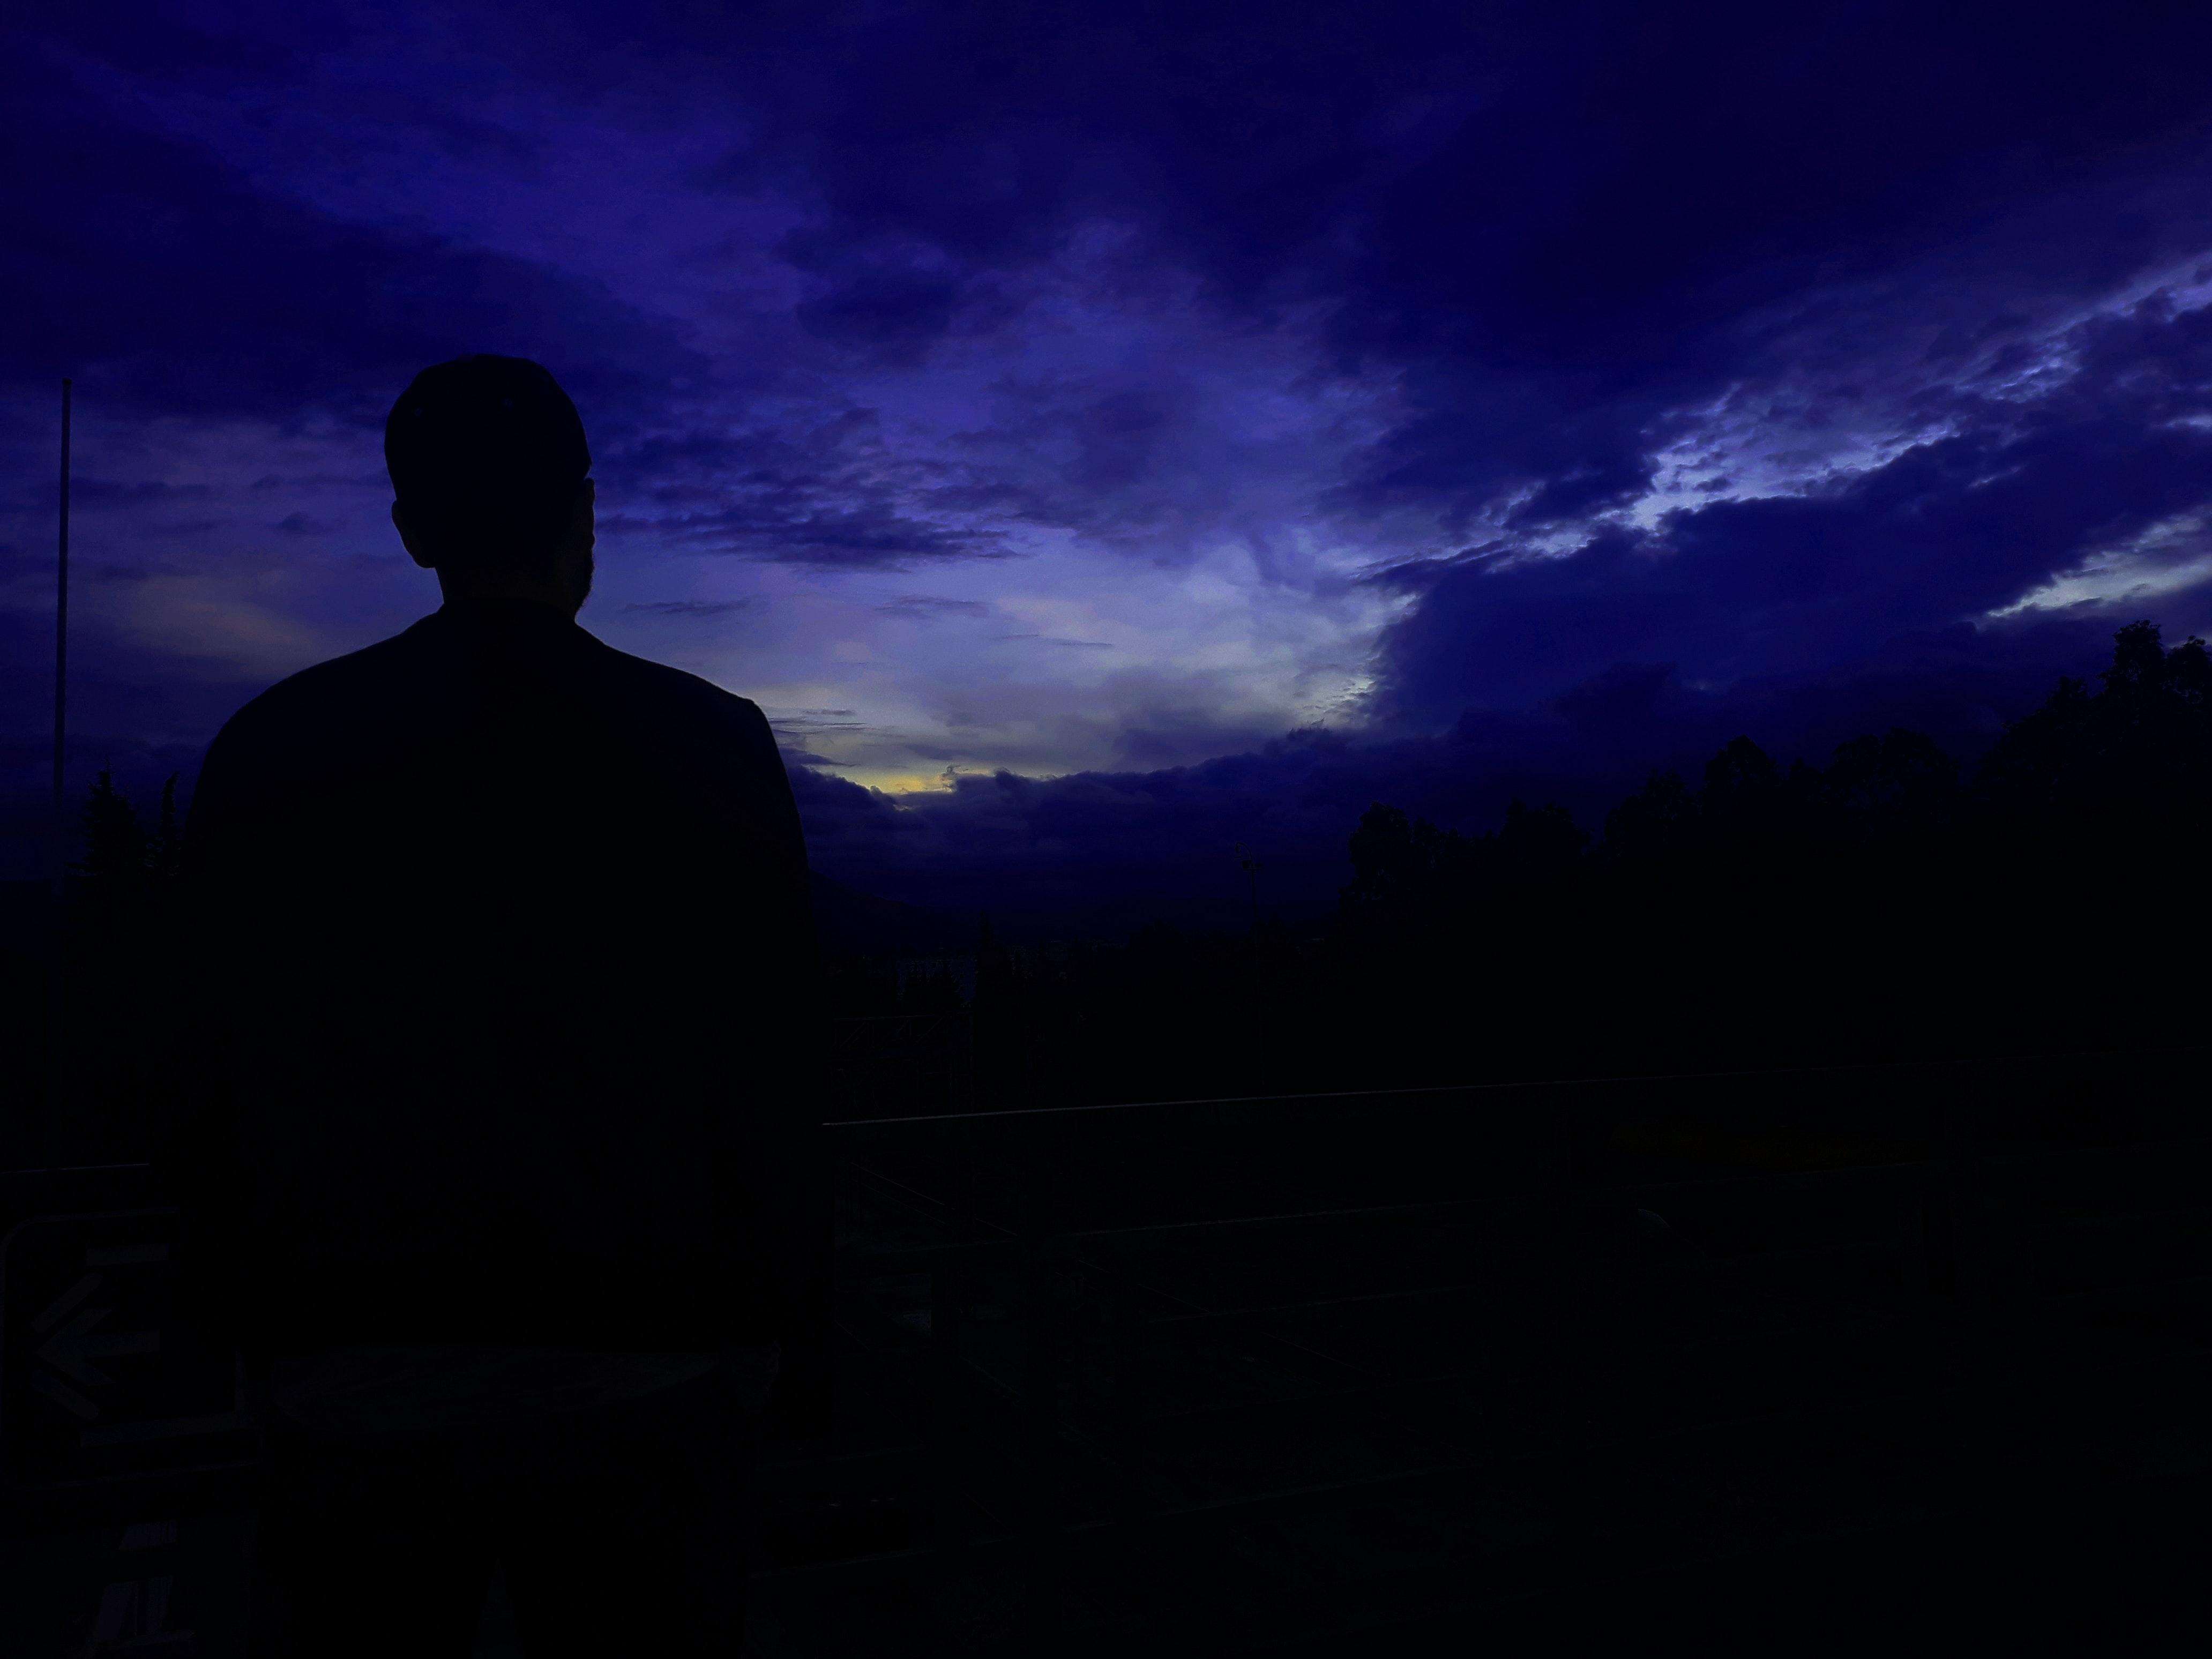 Free stock photo of dark clouds, dramatic sky, storm